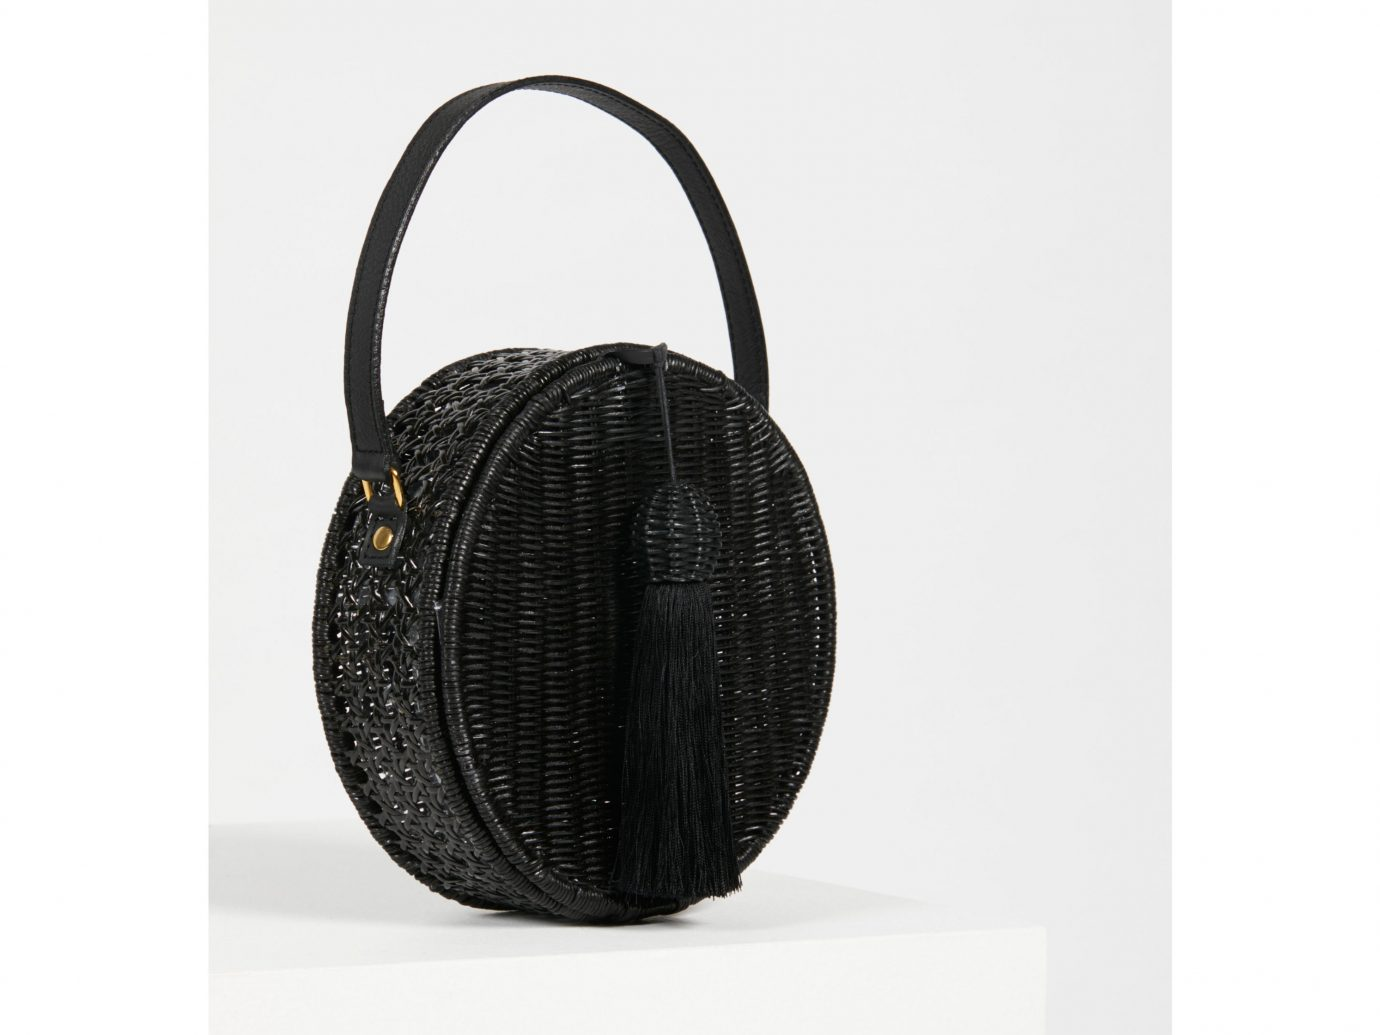 Style + Design bag handbag product black product design shoulder bag leather audio equipment audio